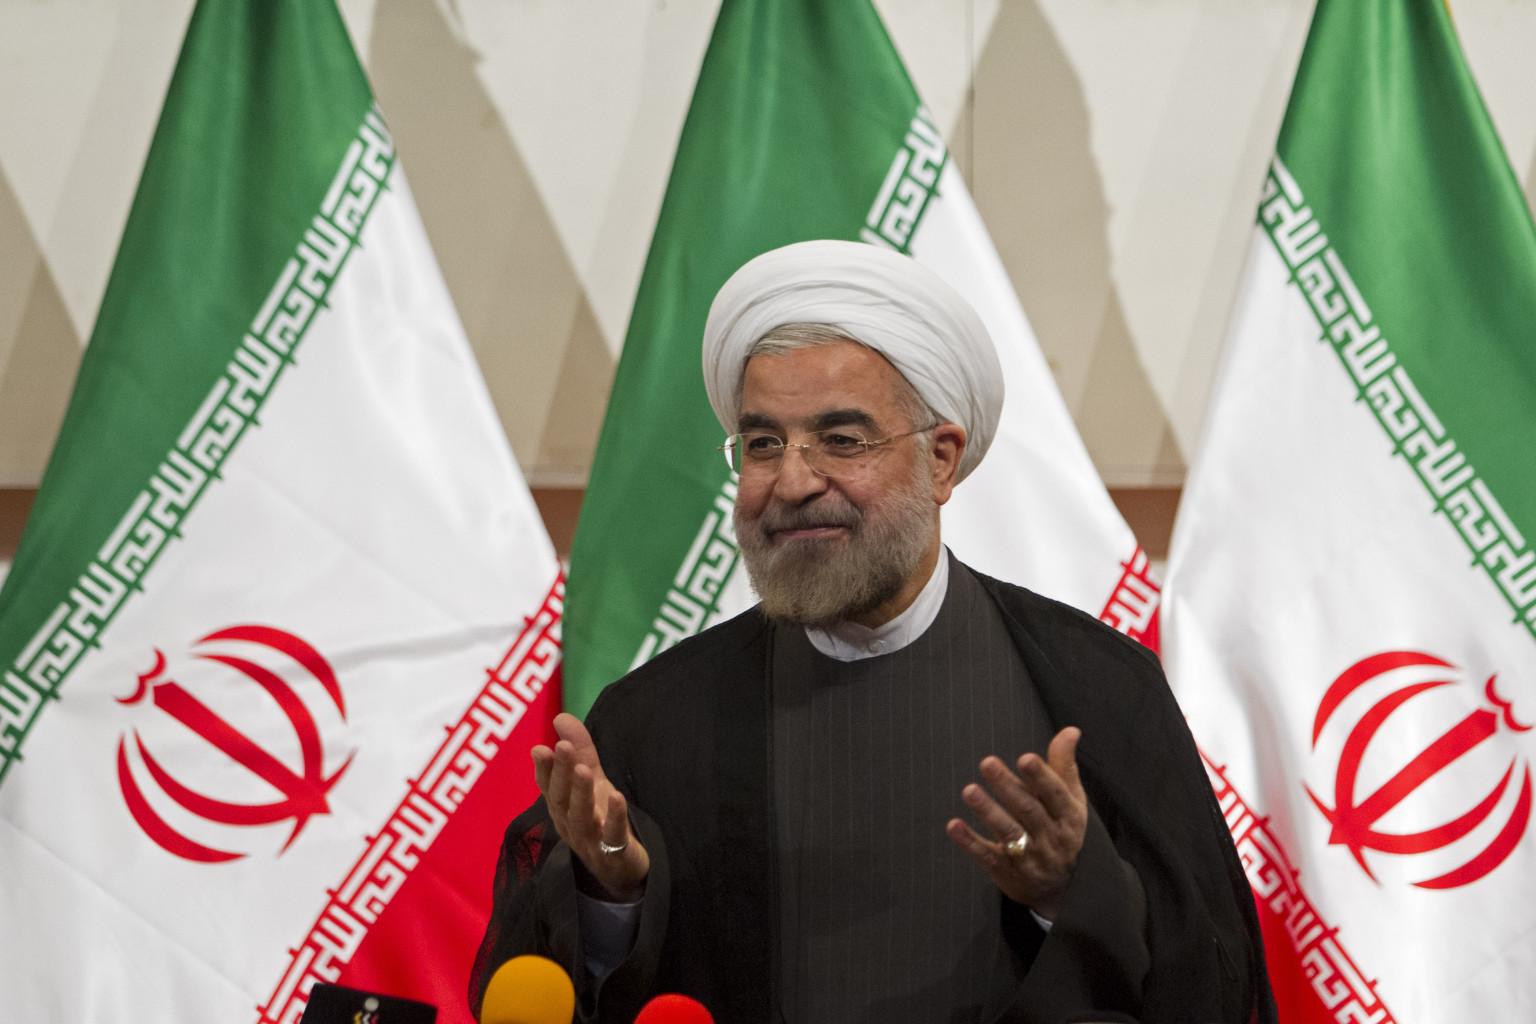 Iran: Election or Selection?, Iran: Election or Selection? – Op-Ed